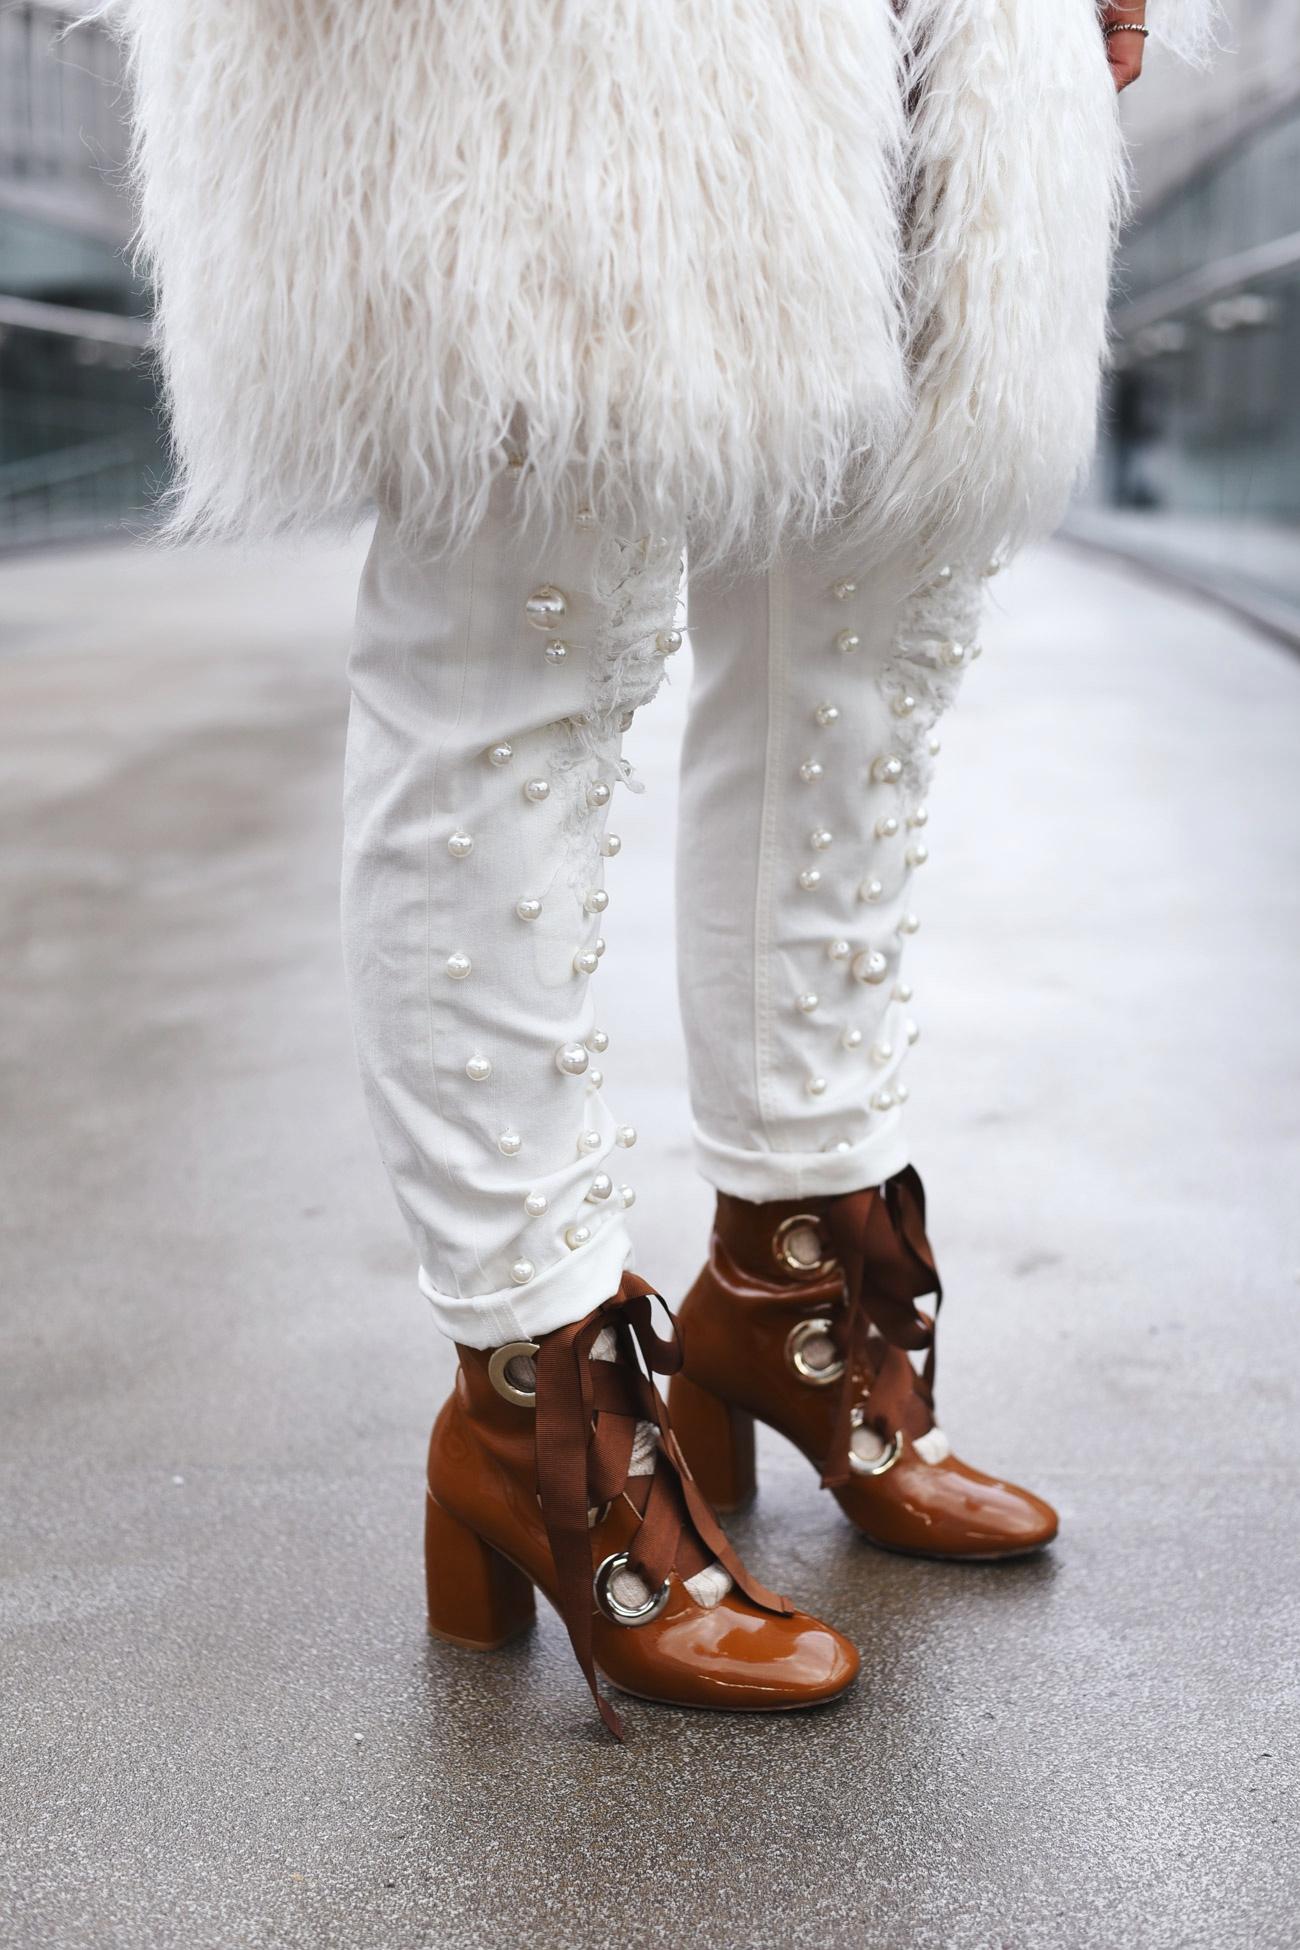 jeanshose-mit-perlen-nina-fashiioncarper-escada-sport-denim-peals-blogger